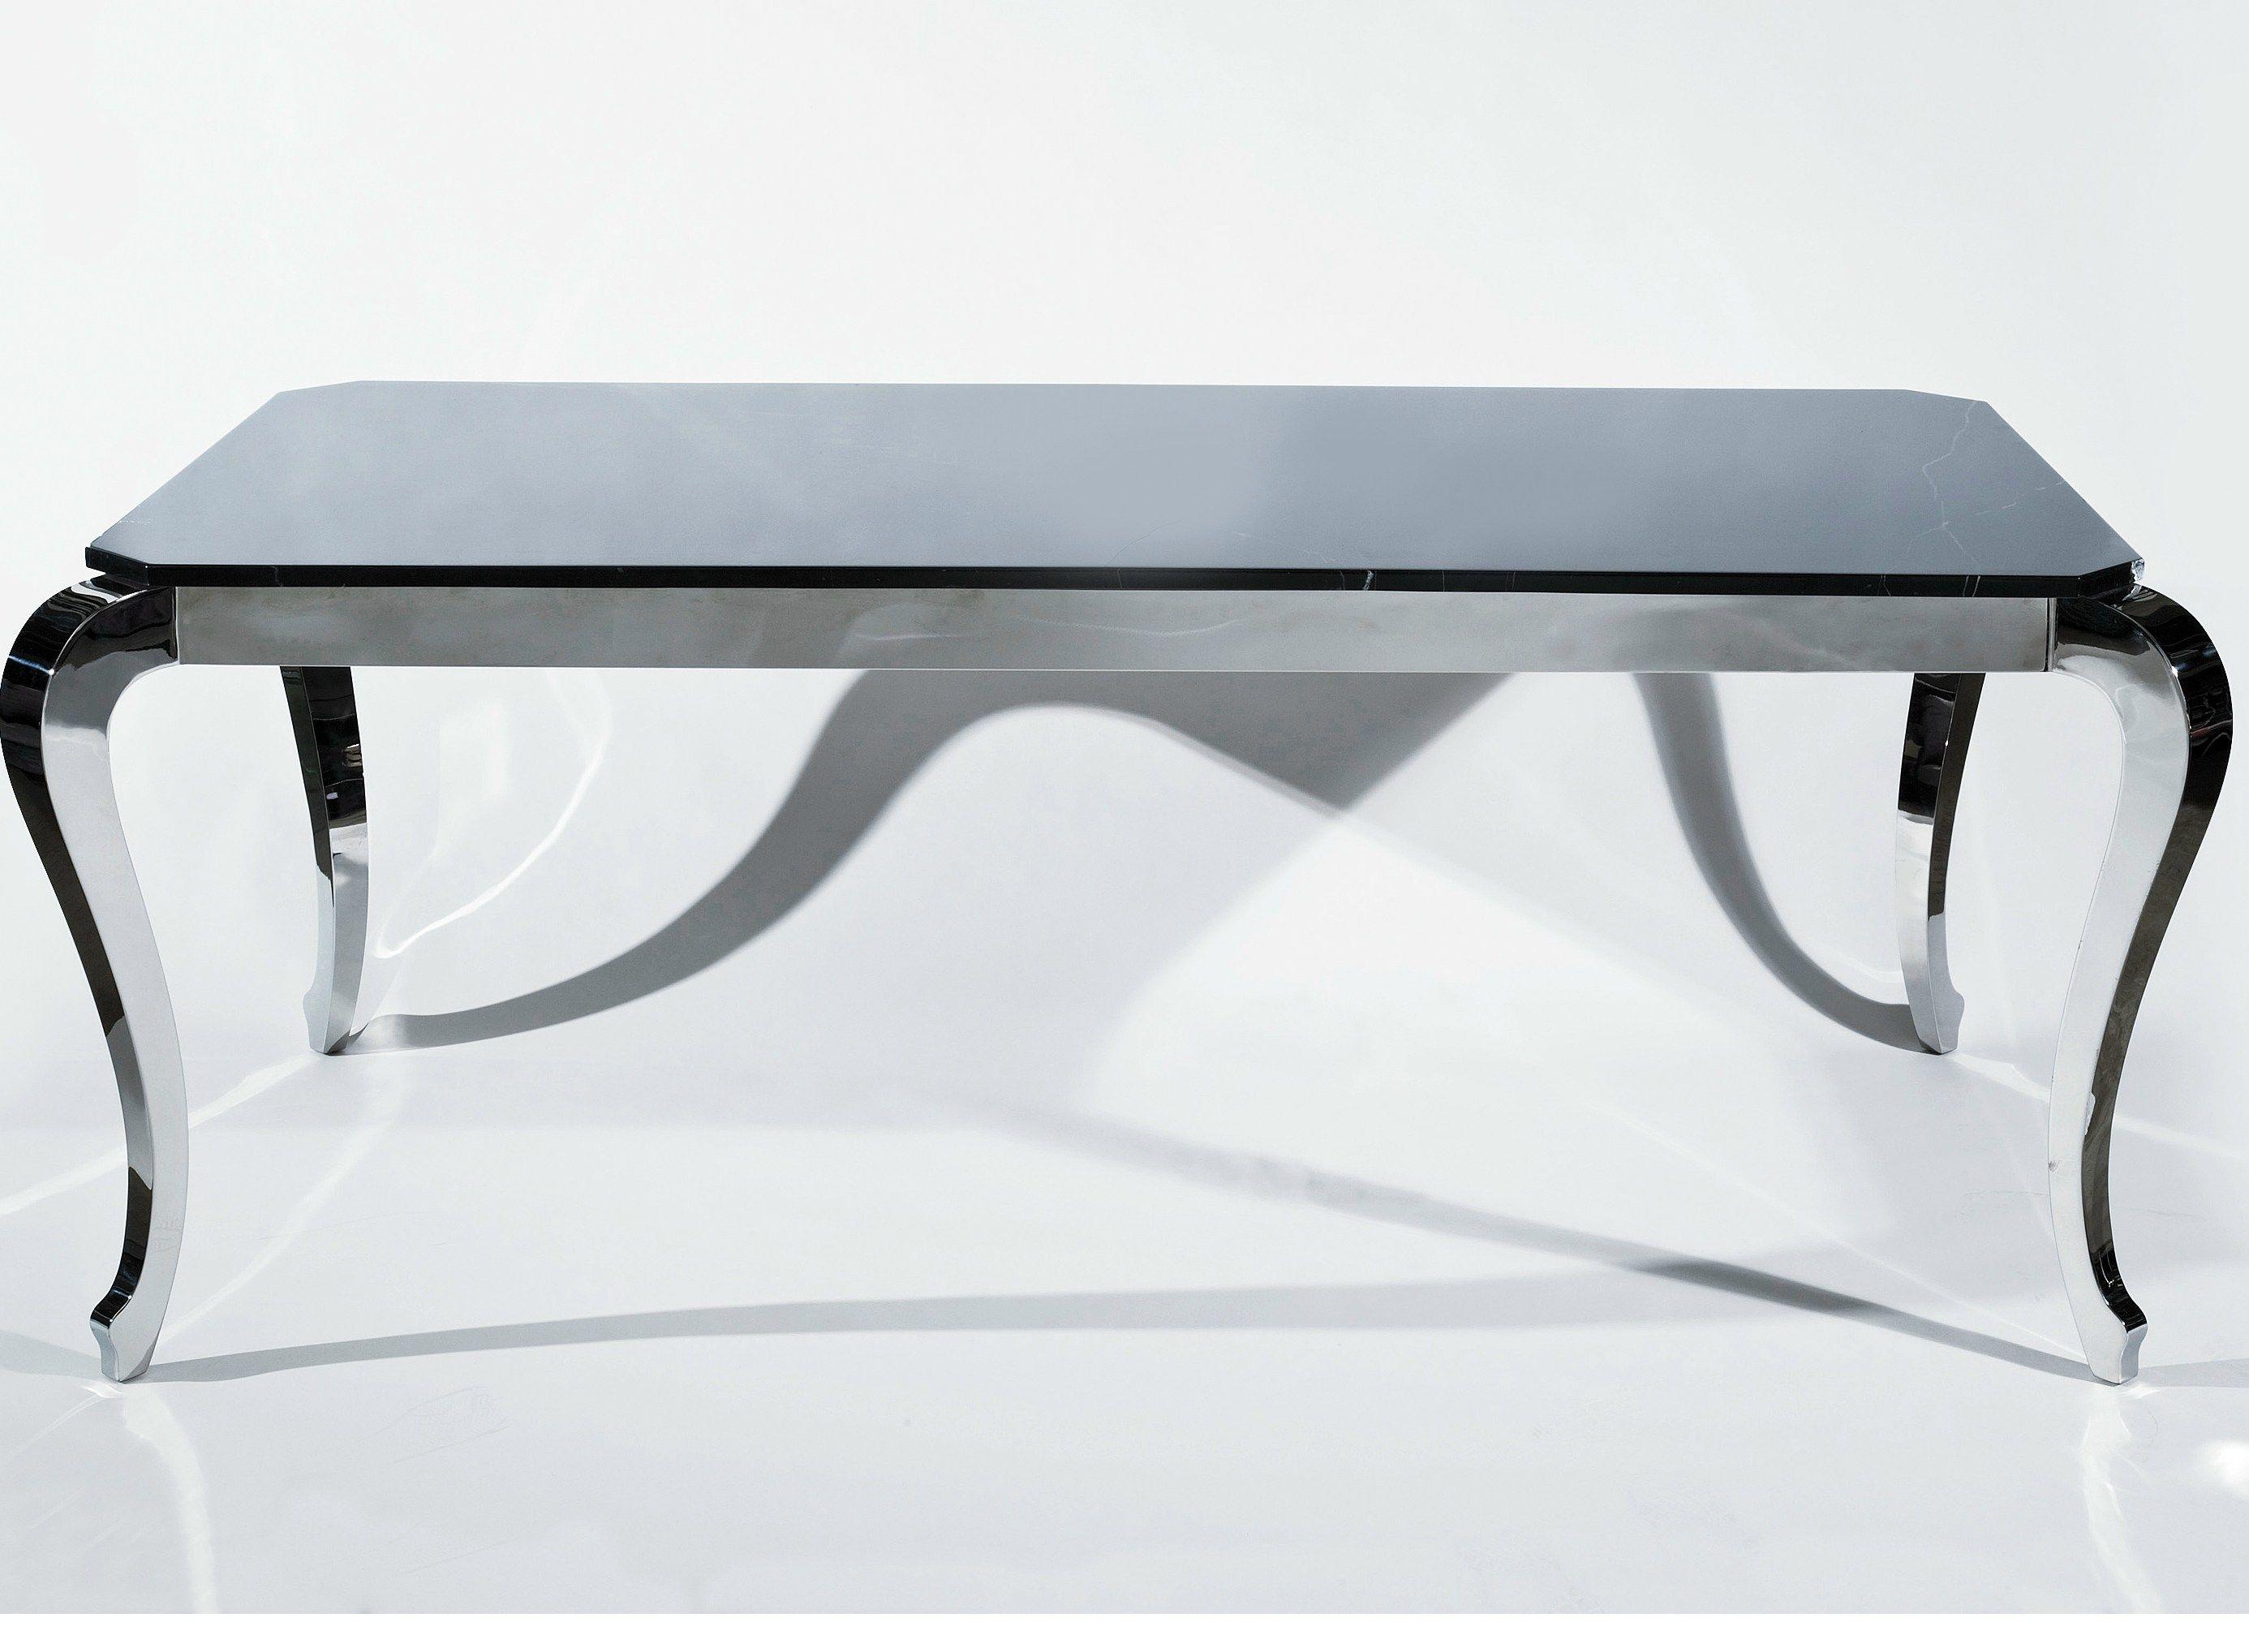 Steel kitchen table bijou steel by kare design for Kare design tisch bijou steel